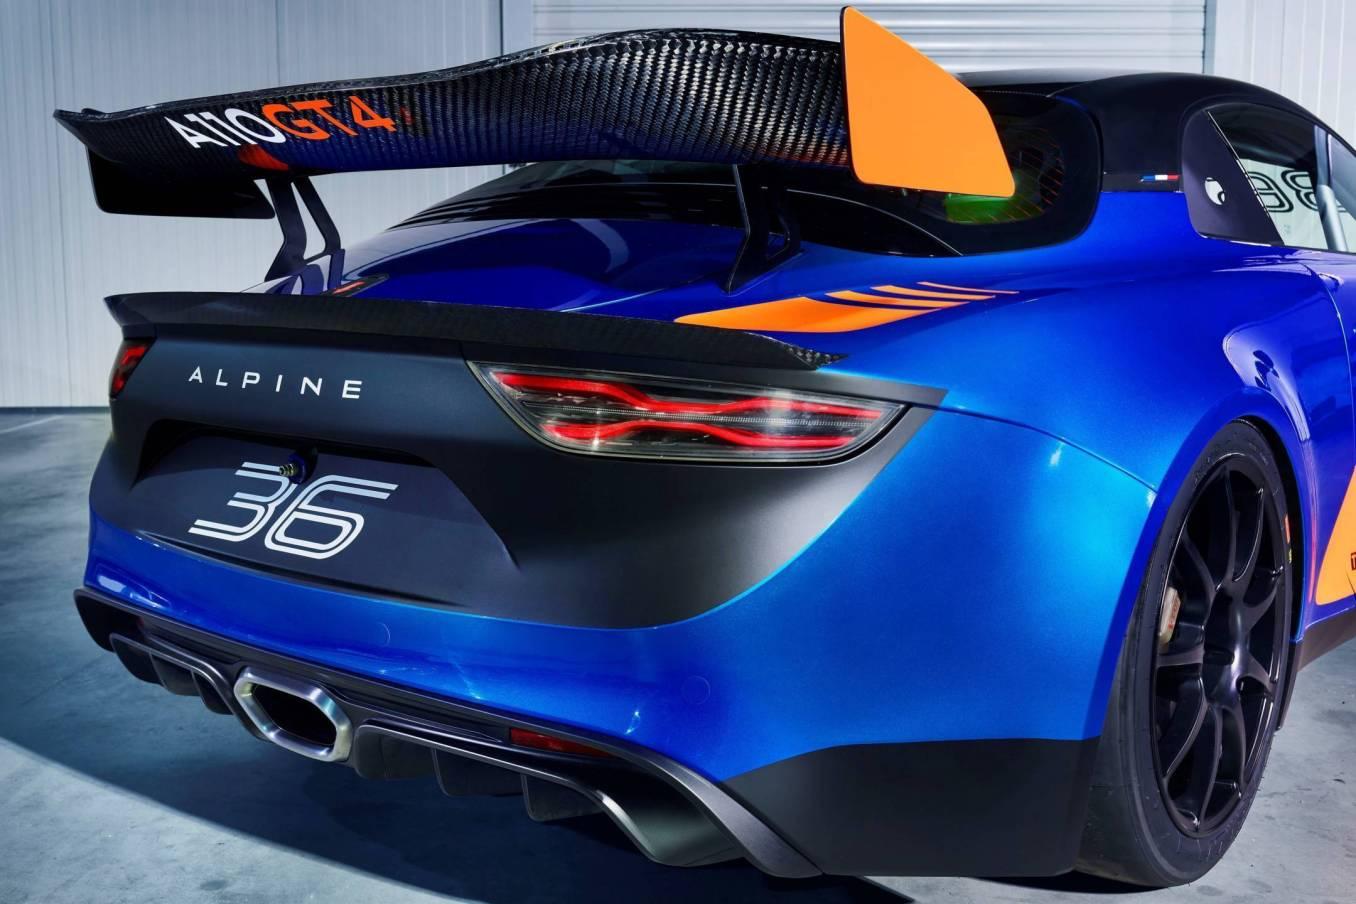 Alpine A110 GT4 Signatech Salon de Genève Racing 2018 4 | Alpine dévoile son A110 GT4 au Salon de Genève avec Signatech !